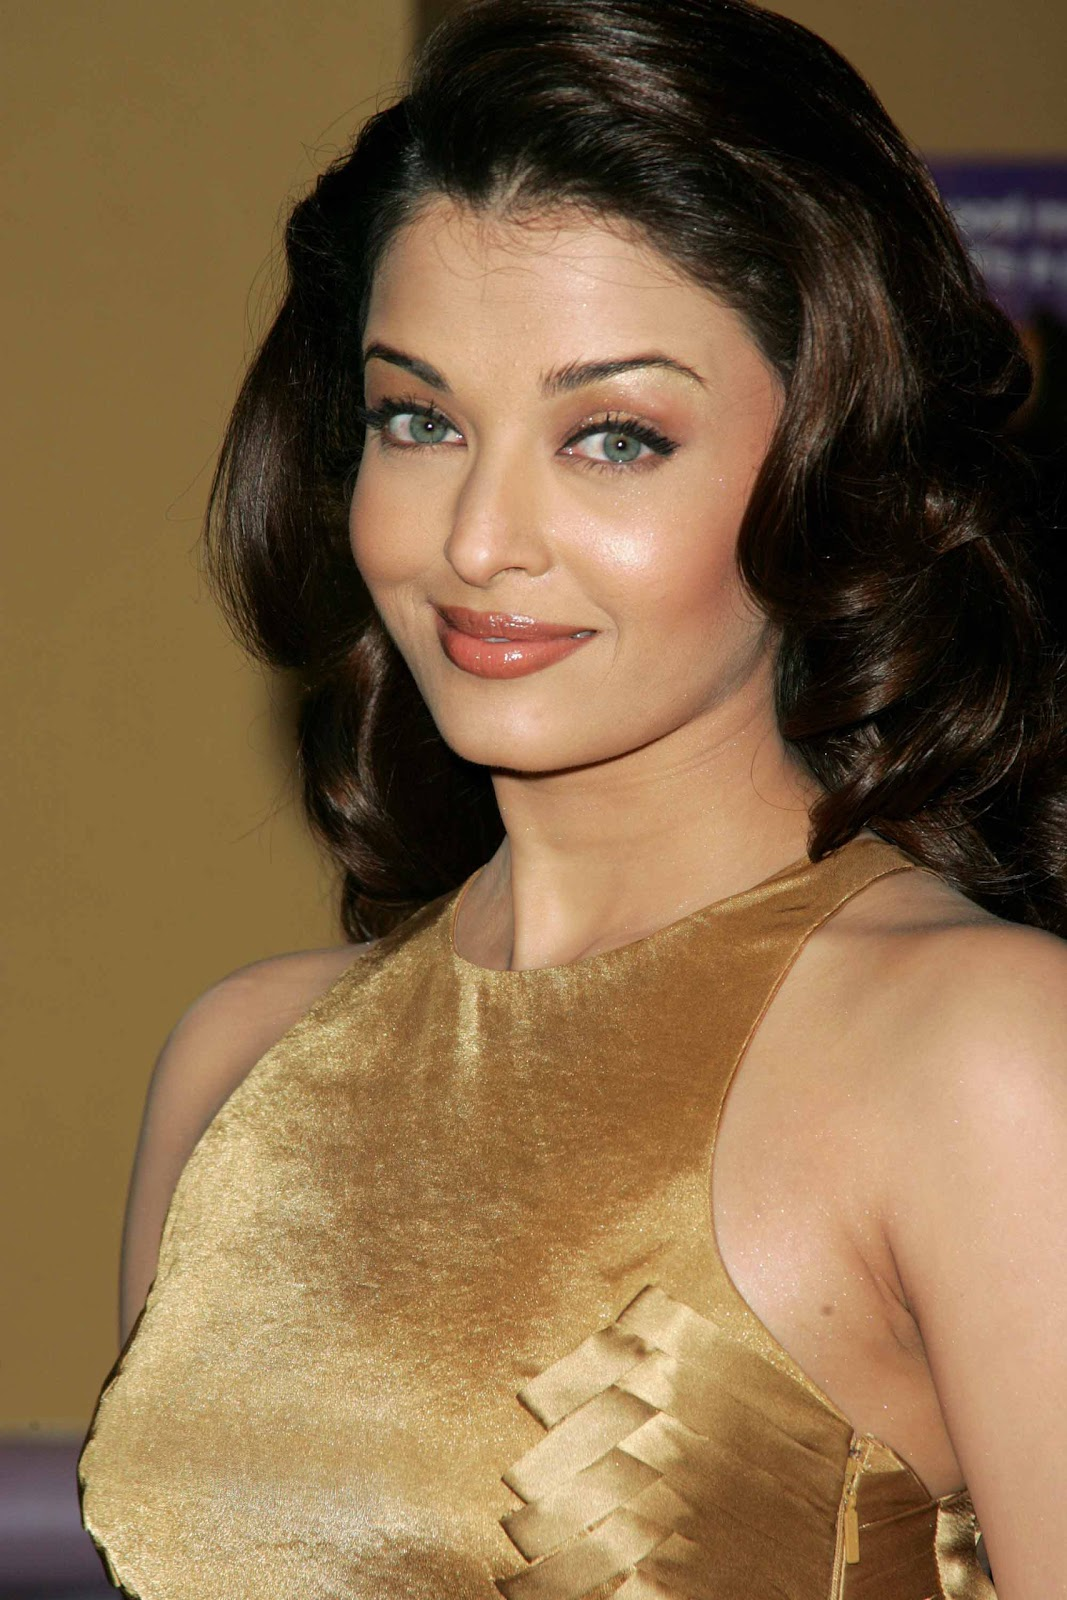 http://3.bp.blogspot.com/-piTIcvlyZcY/Txv2EwxRqjI/AAAAAAAAAPw/unKlxyR7Dr4/s1600/Aishwarya+Rai+Hot+Pics+HQ+6.jpg